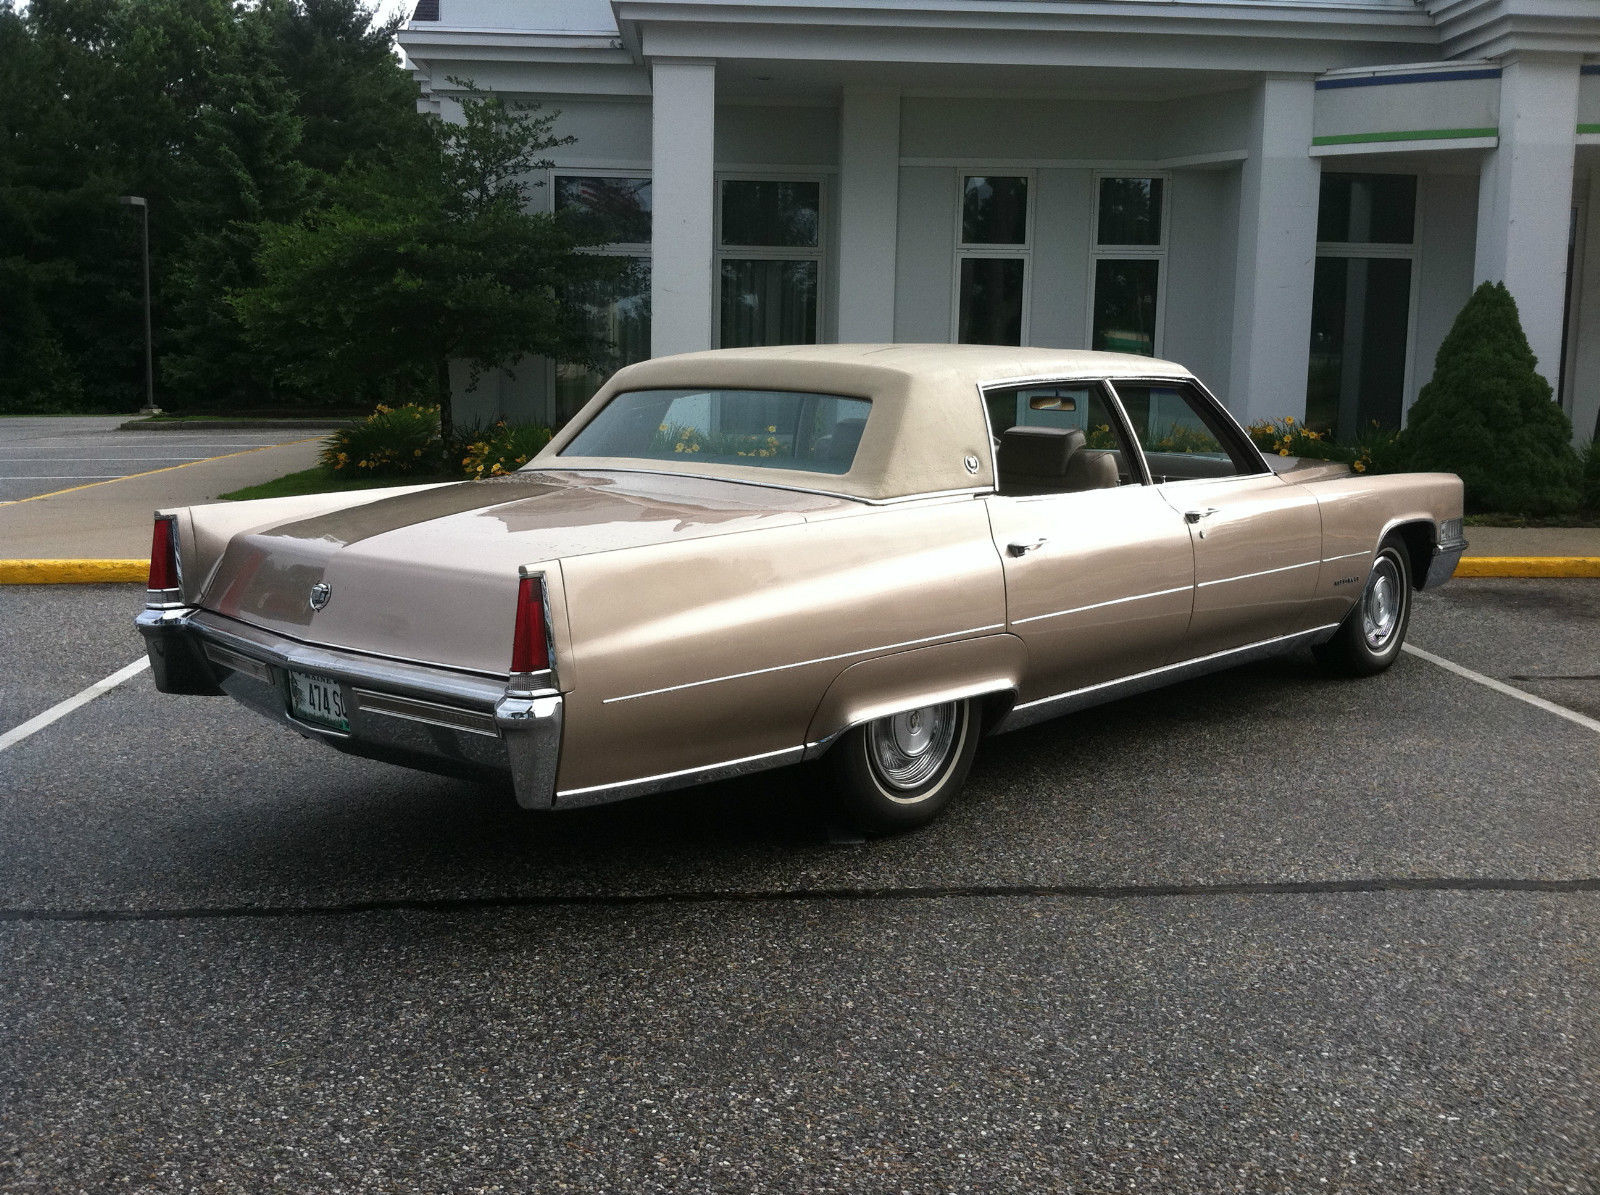 1969 cadillac fleetwood brougham 8924 original miles ernie clair 39 s personal car. Black Bedroom Furniture Sets. Home Design Ideas